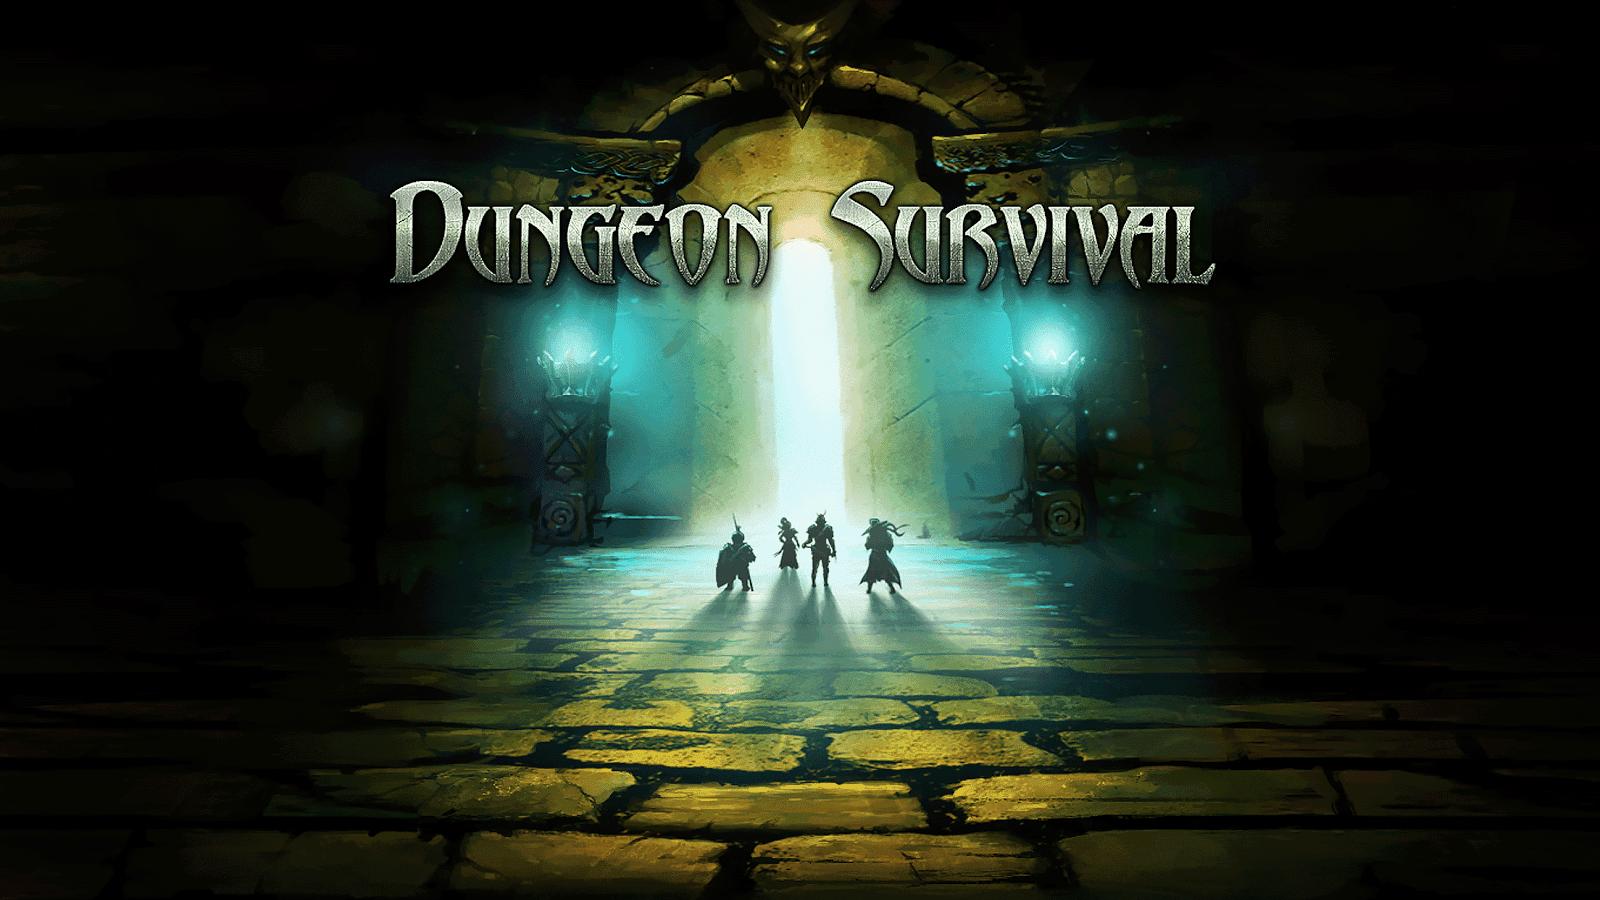 Dungeon Survival Apk - Download Gratis Game Android Terbaru